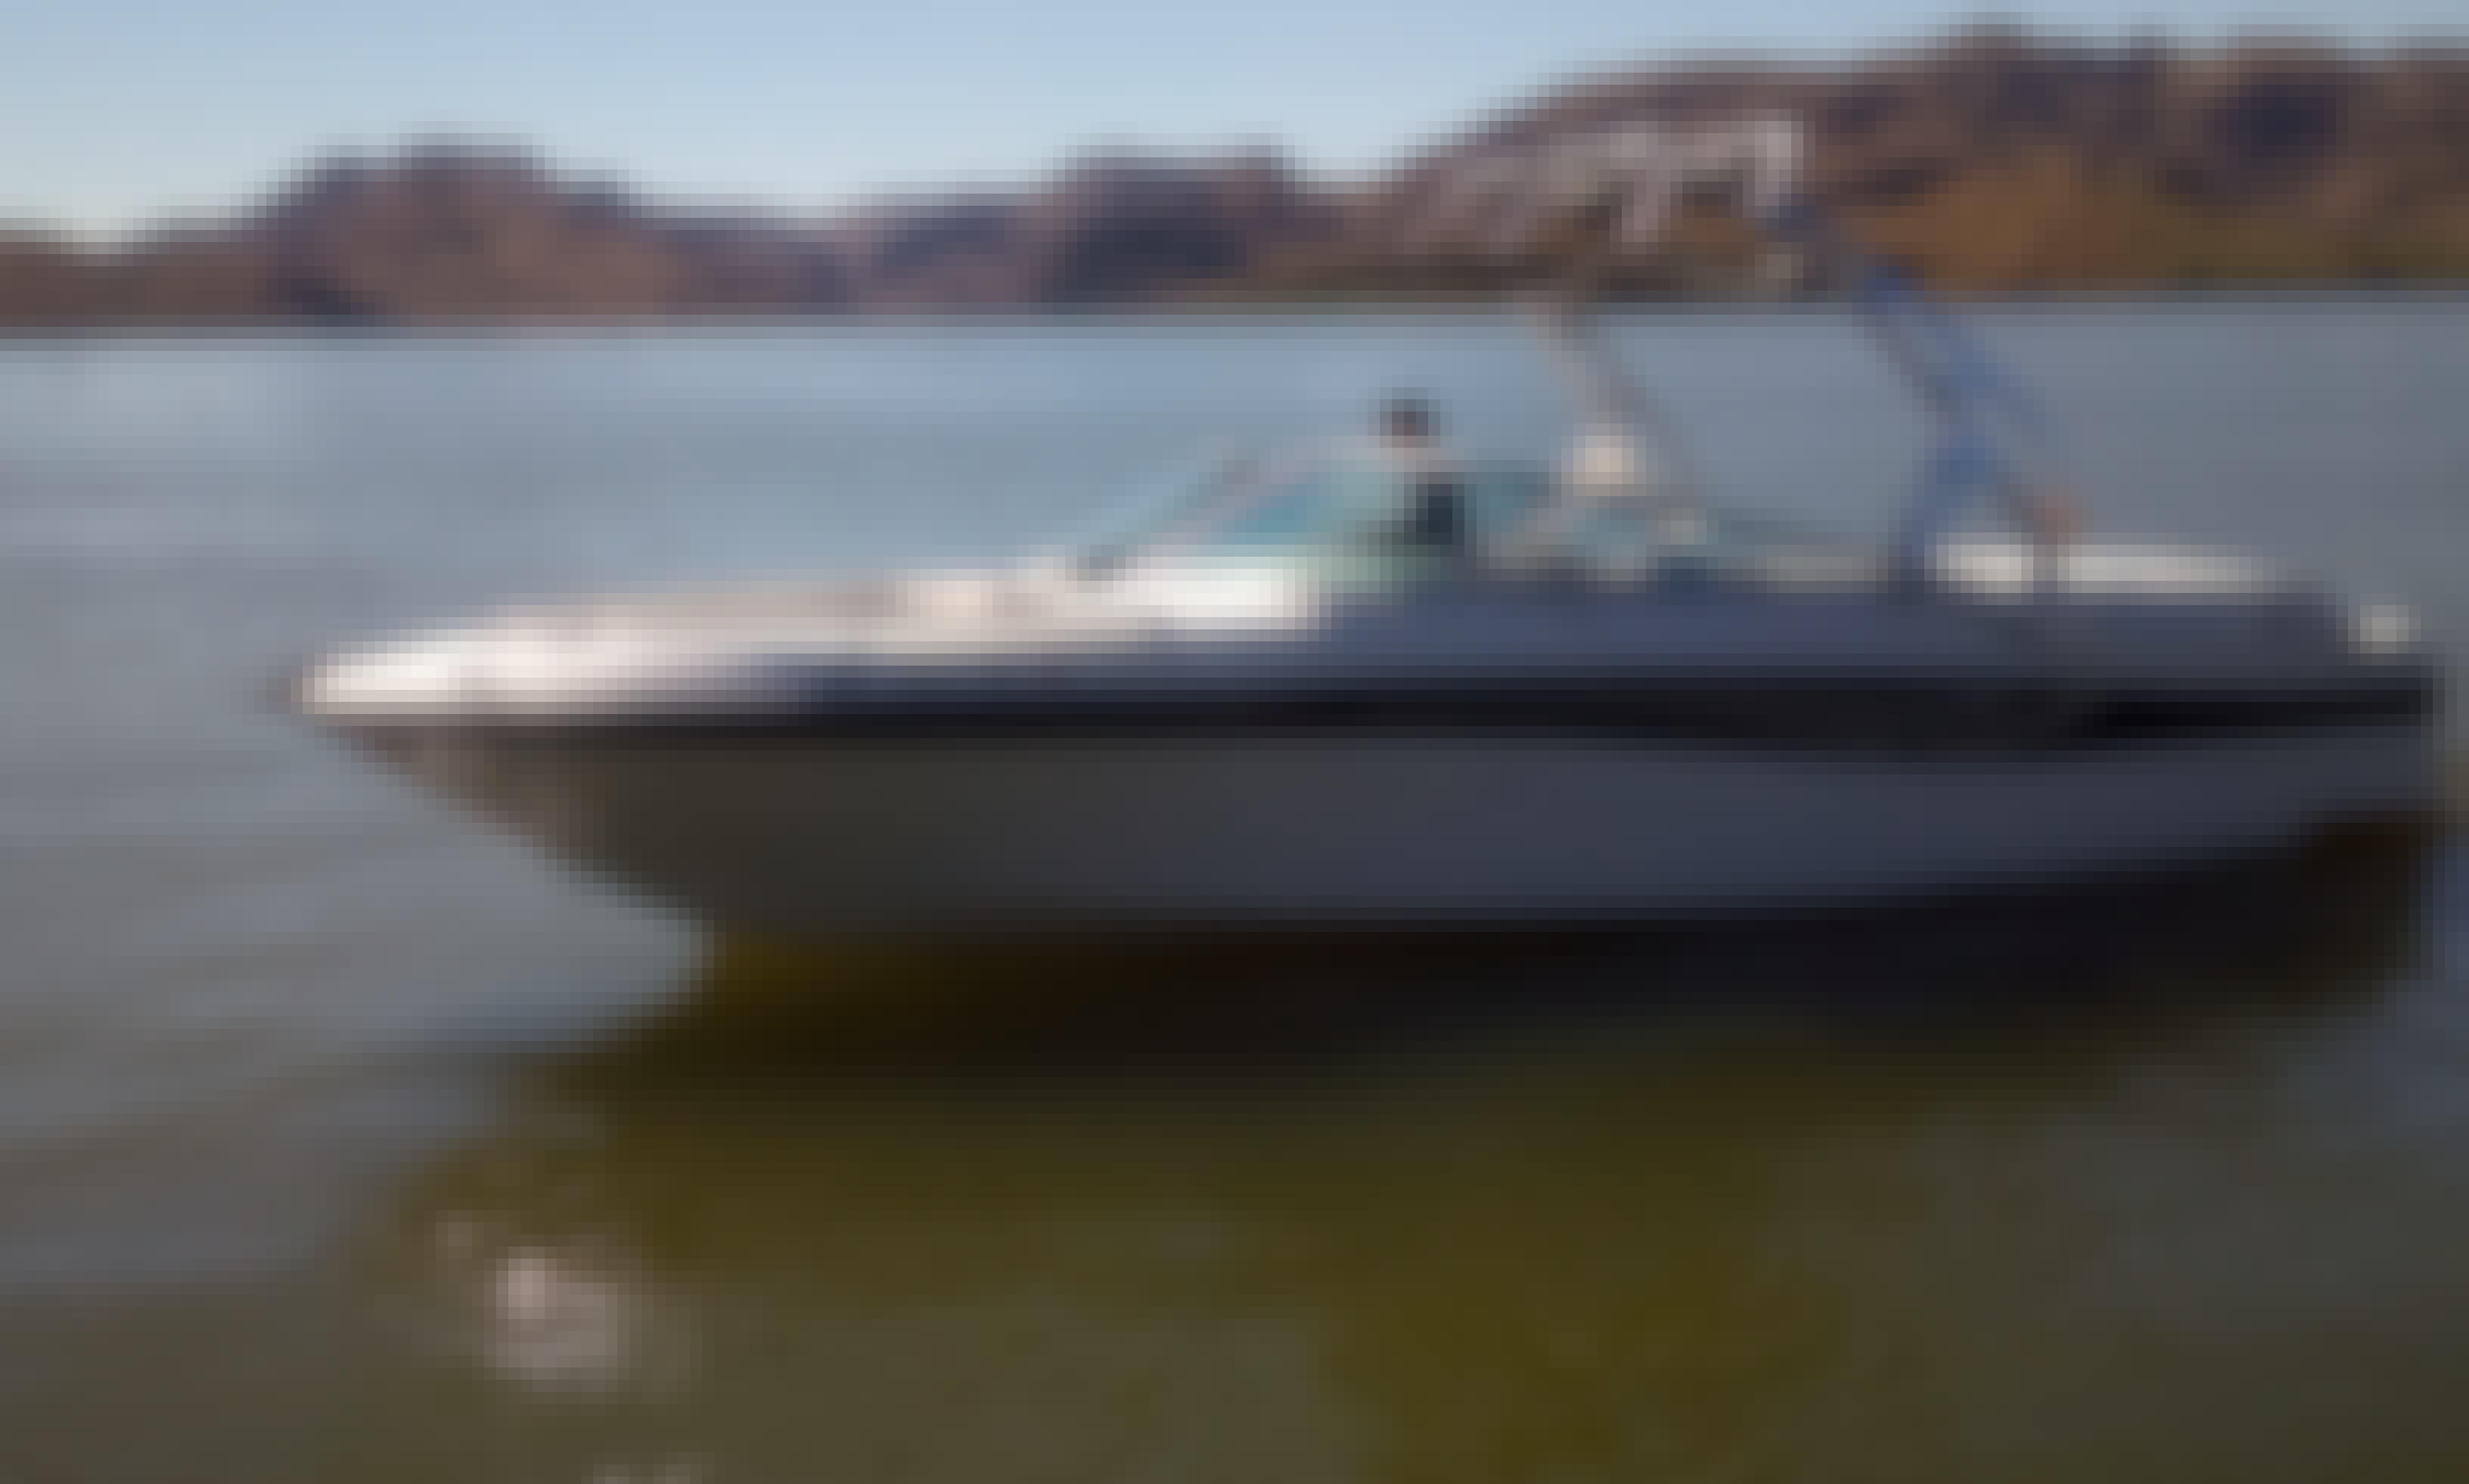 Rent 26' Powerboat for 11 People in Peoria, Arizona